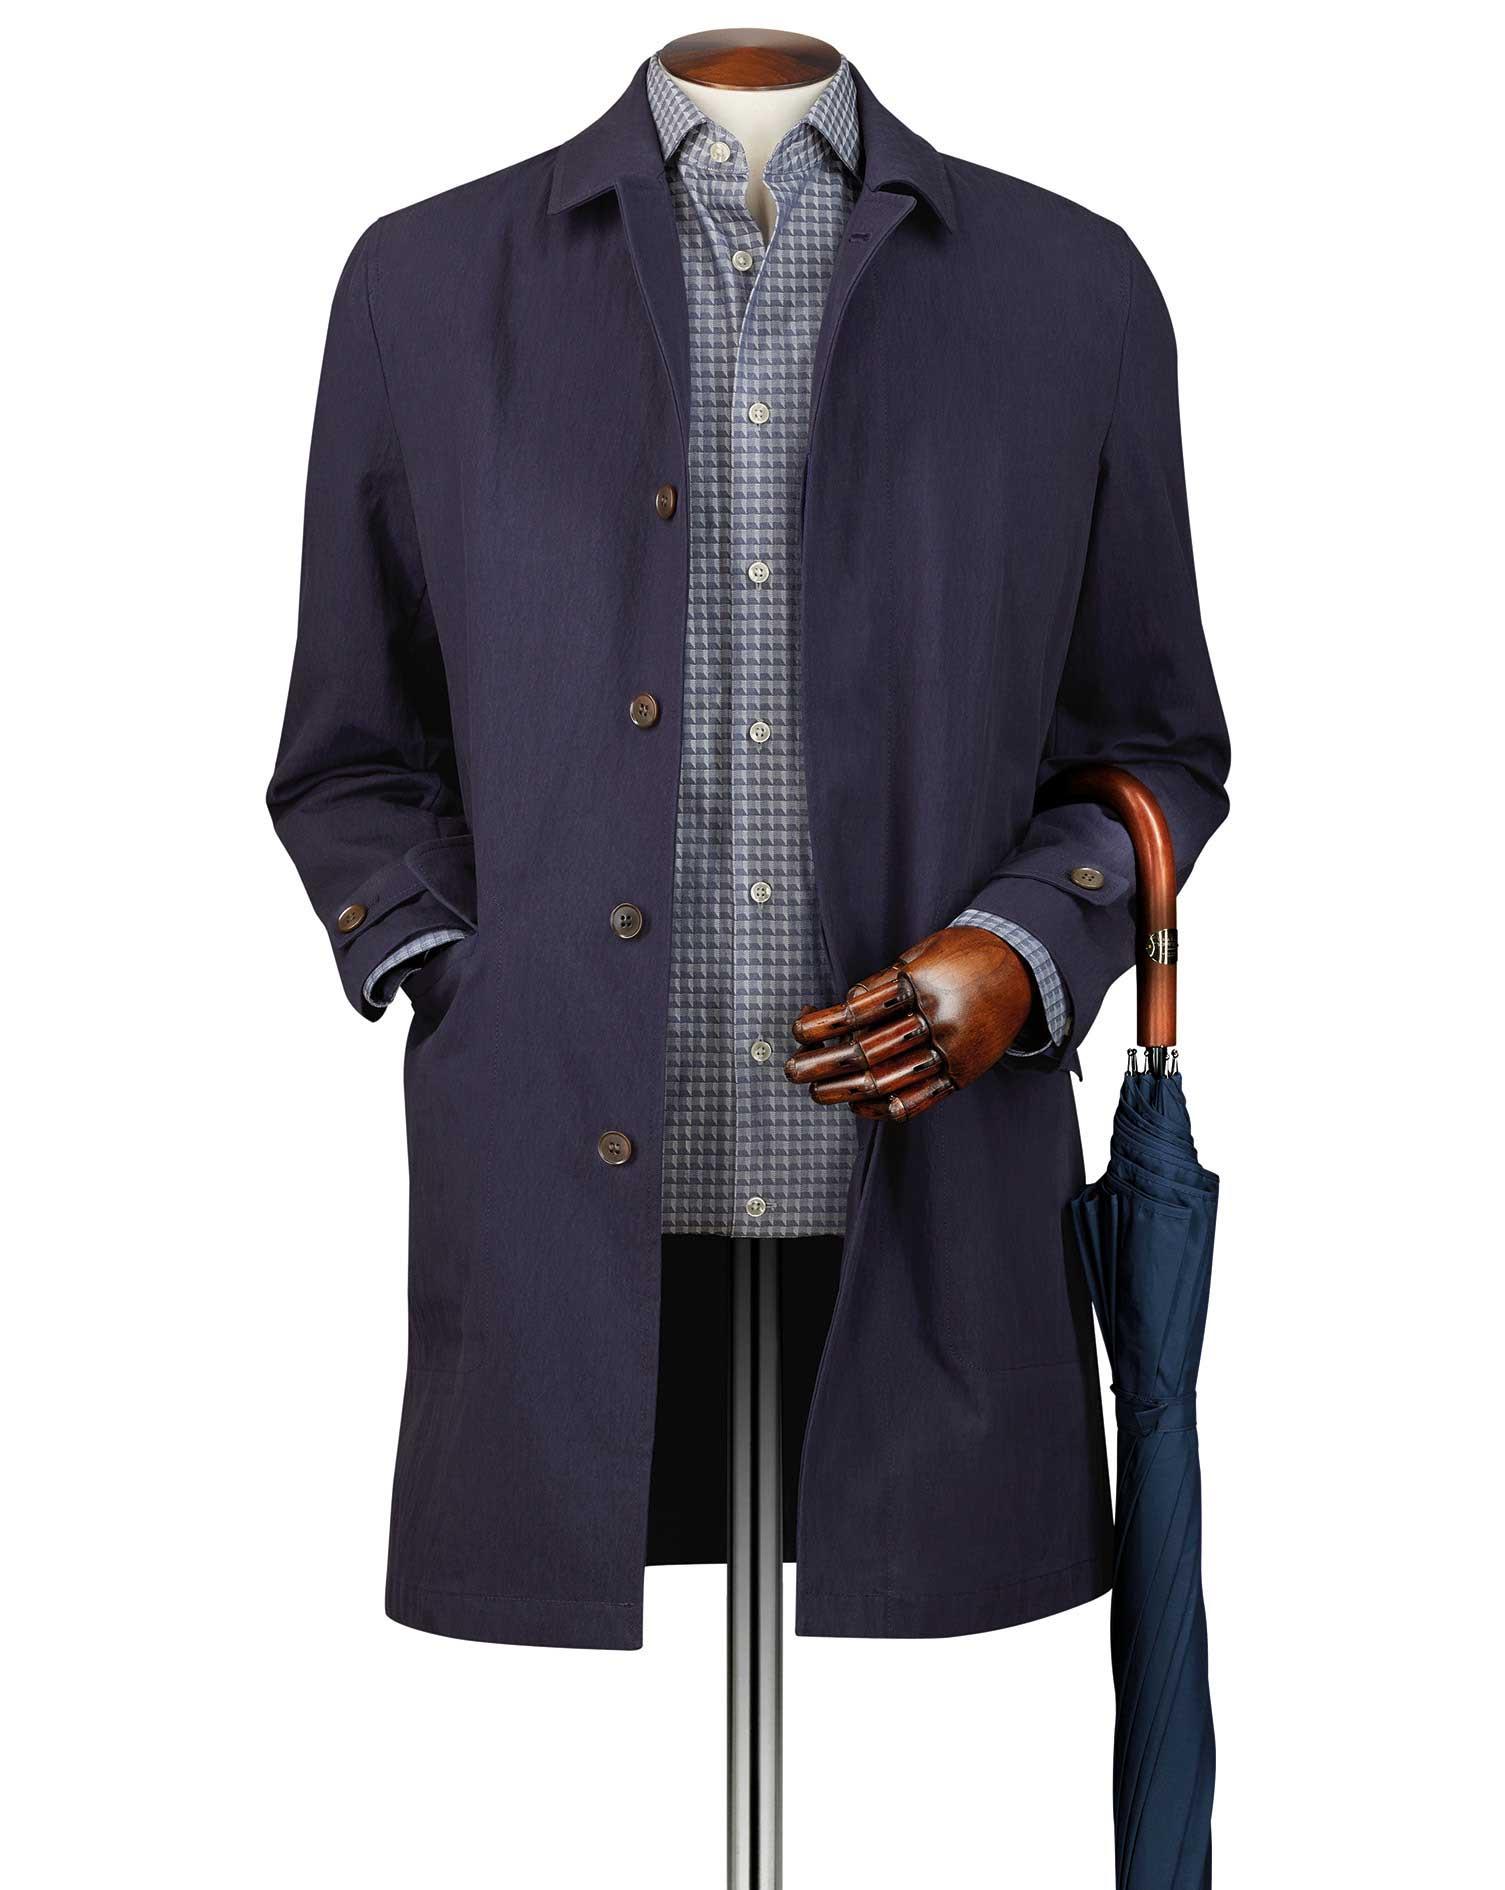 Navy Italian Cotton RainCotton coat Size 38 Regular by Charles Tyrwhitt